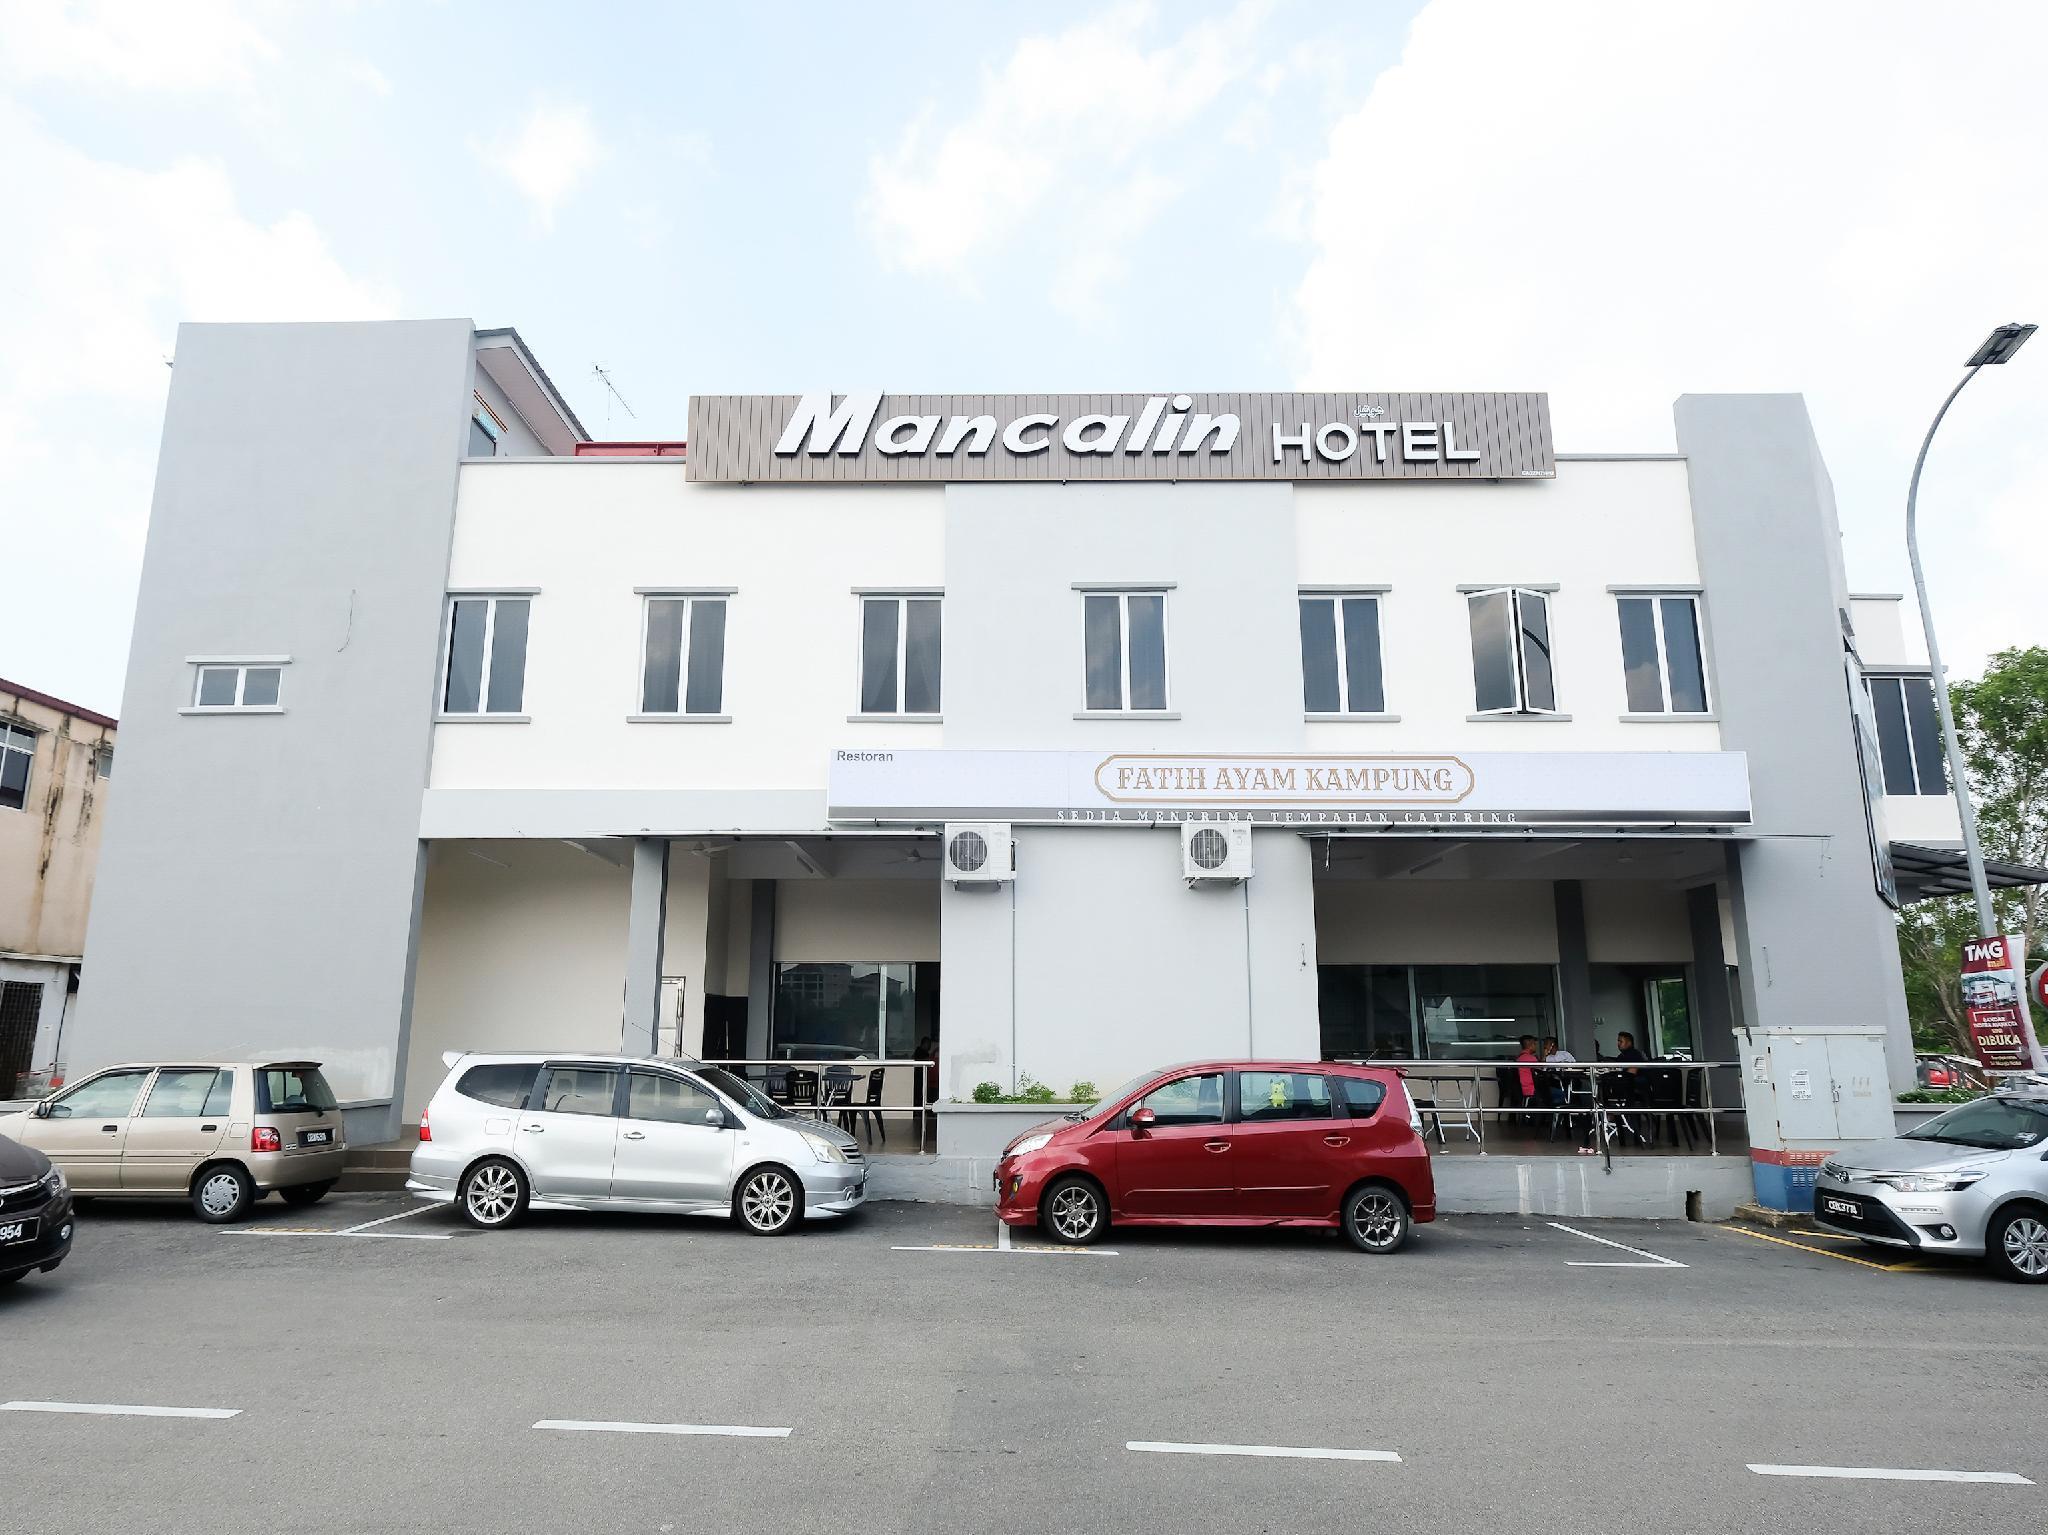 OYO 43935 Mancalin Hotel